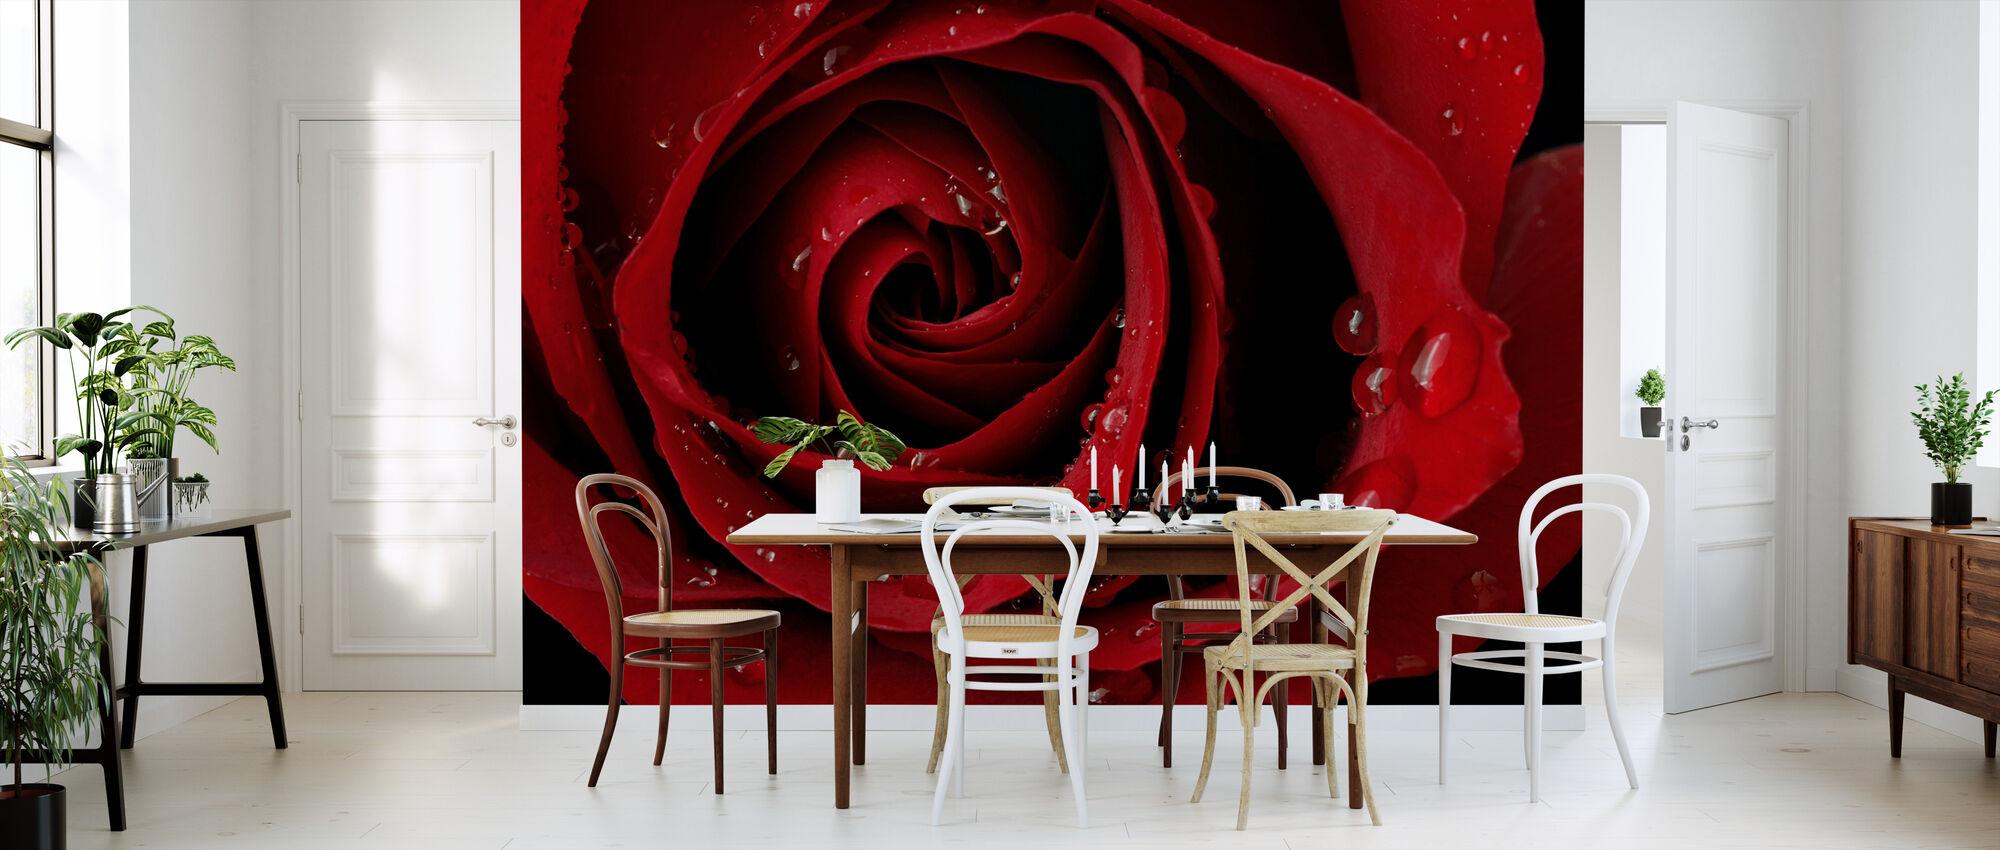 Mørk Rød Rose - Tapet - Køkken